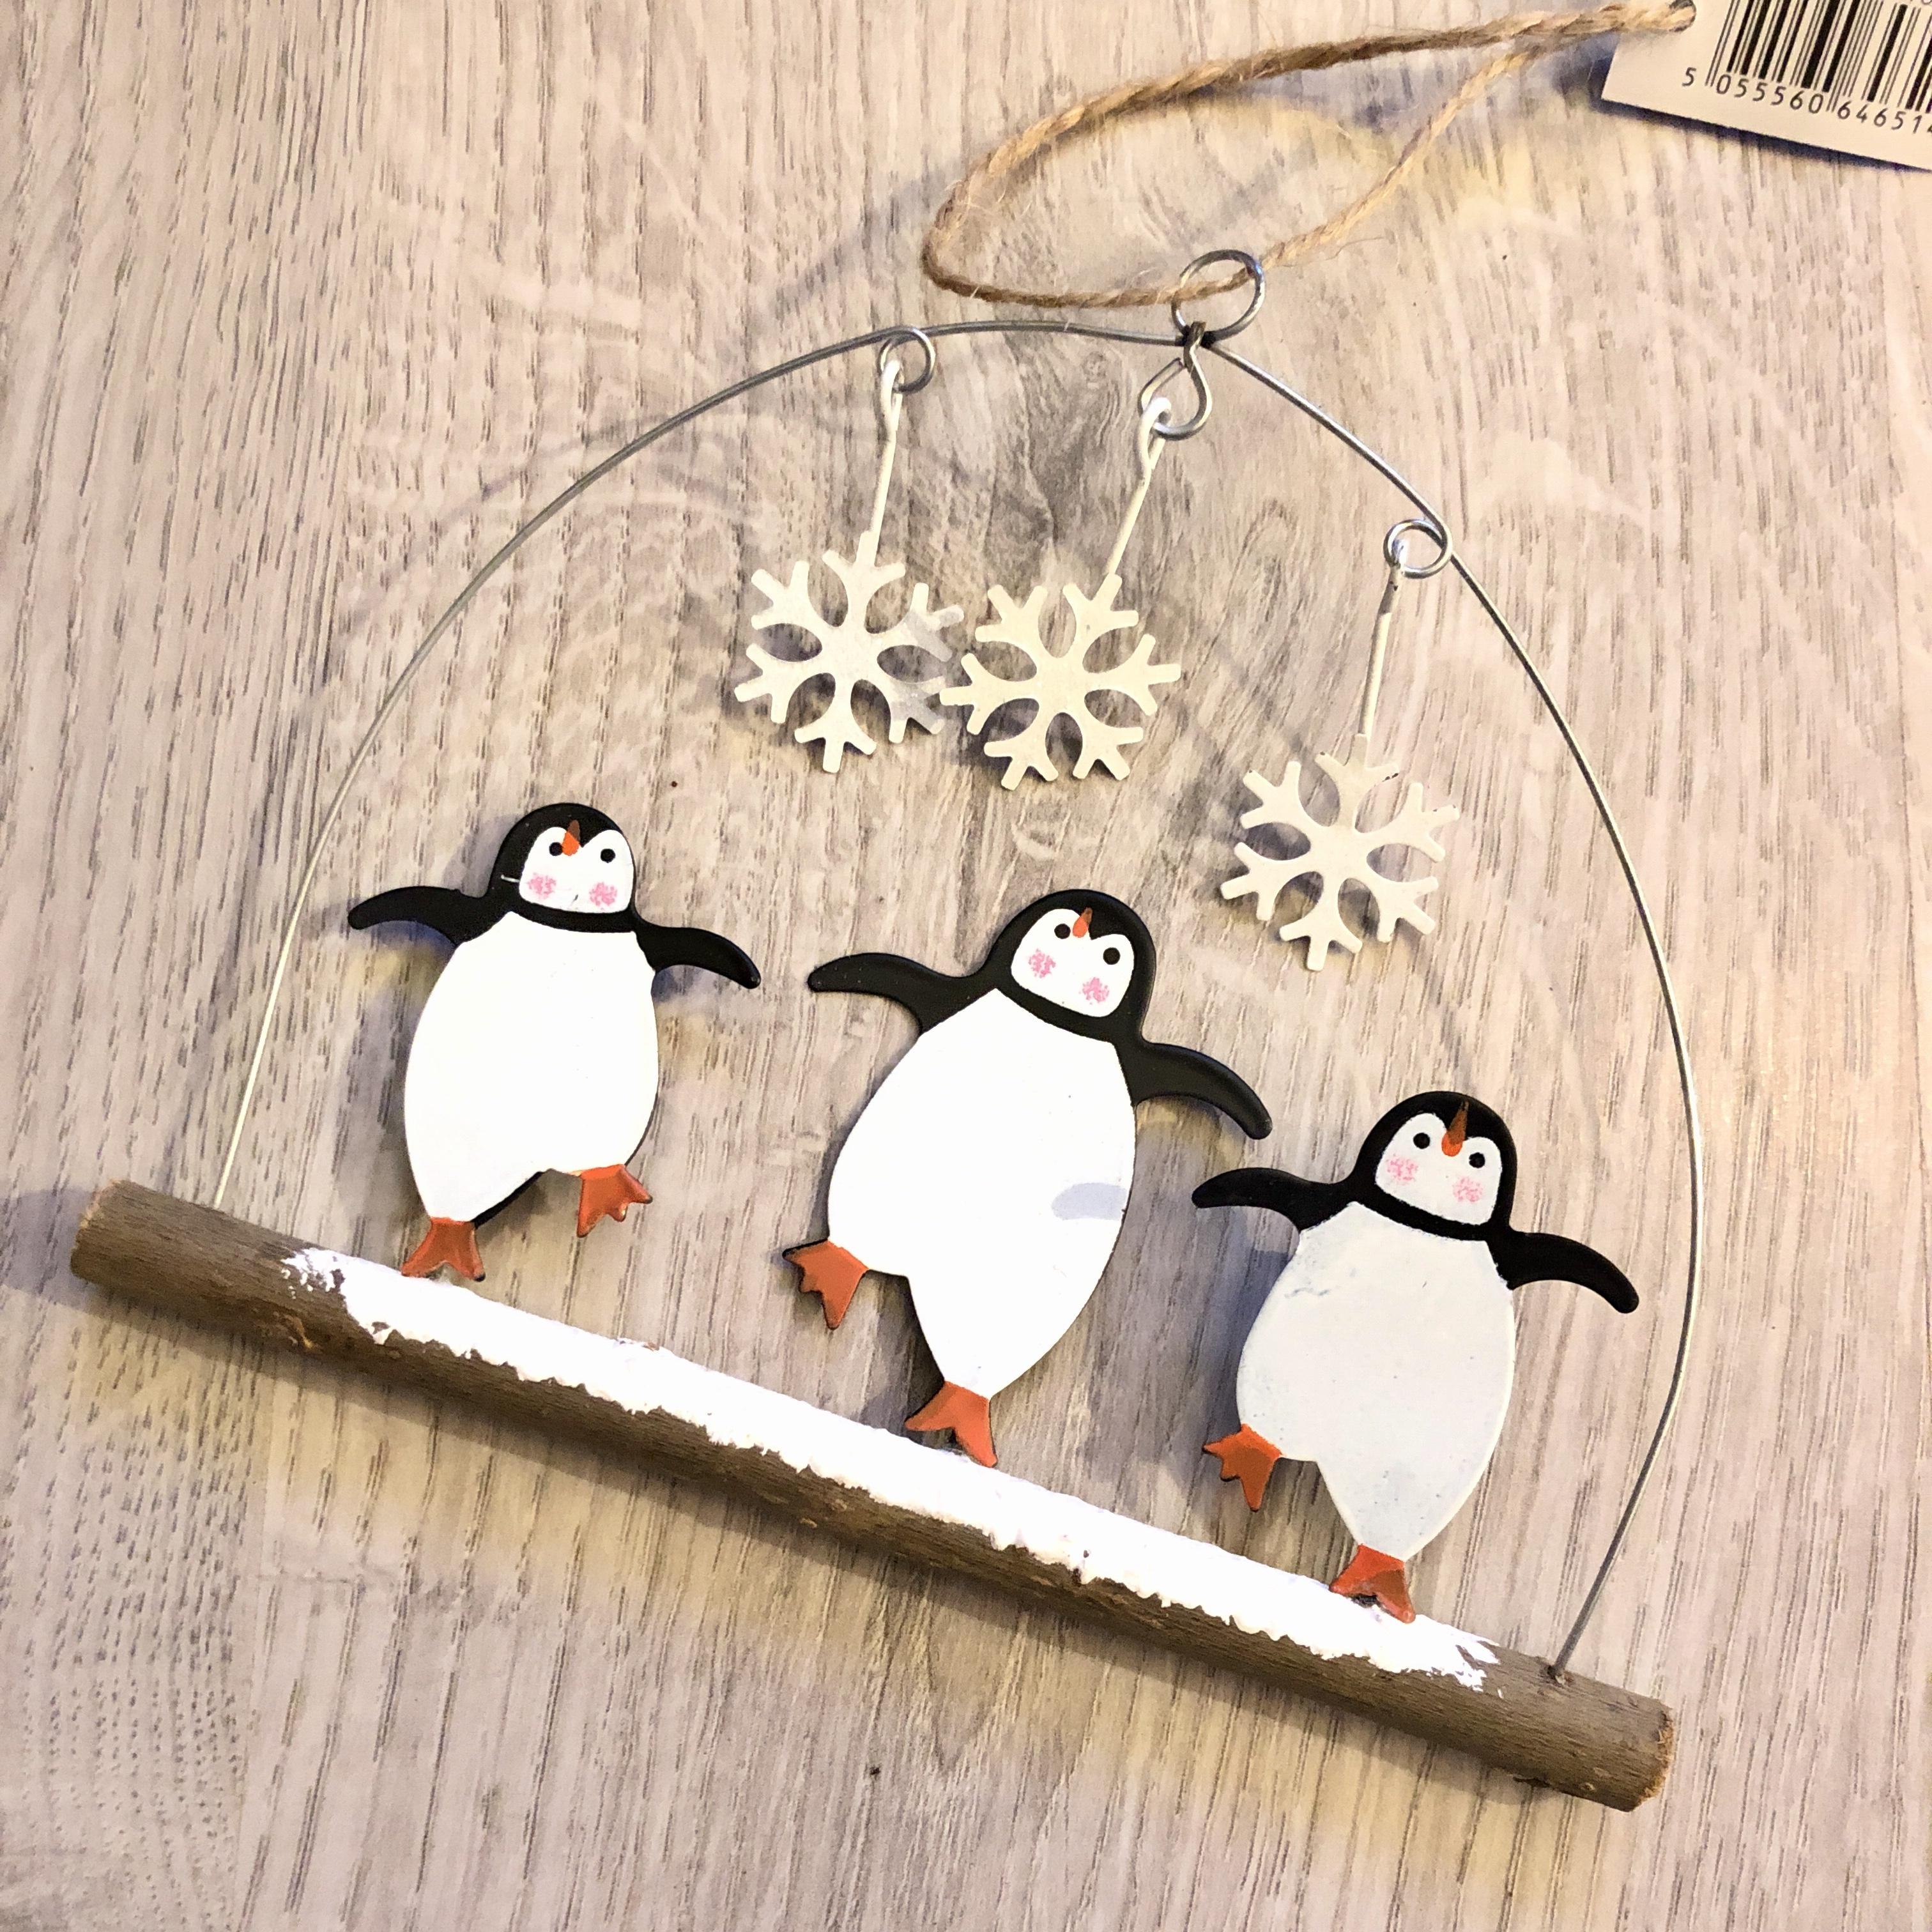 Dancing penguin dudes hanging Christmas decoration by shoeless joe